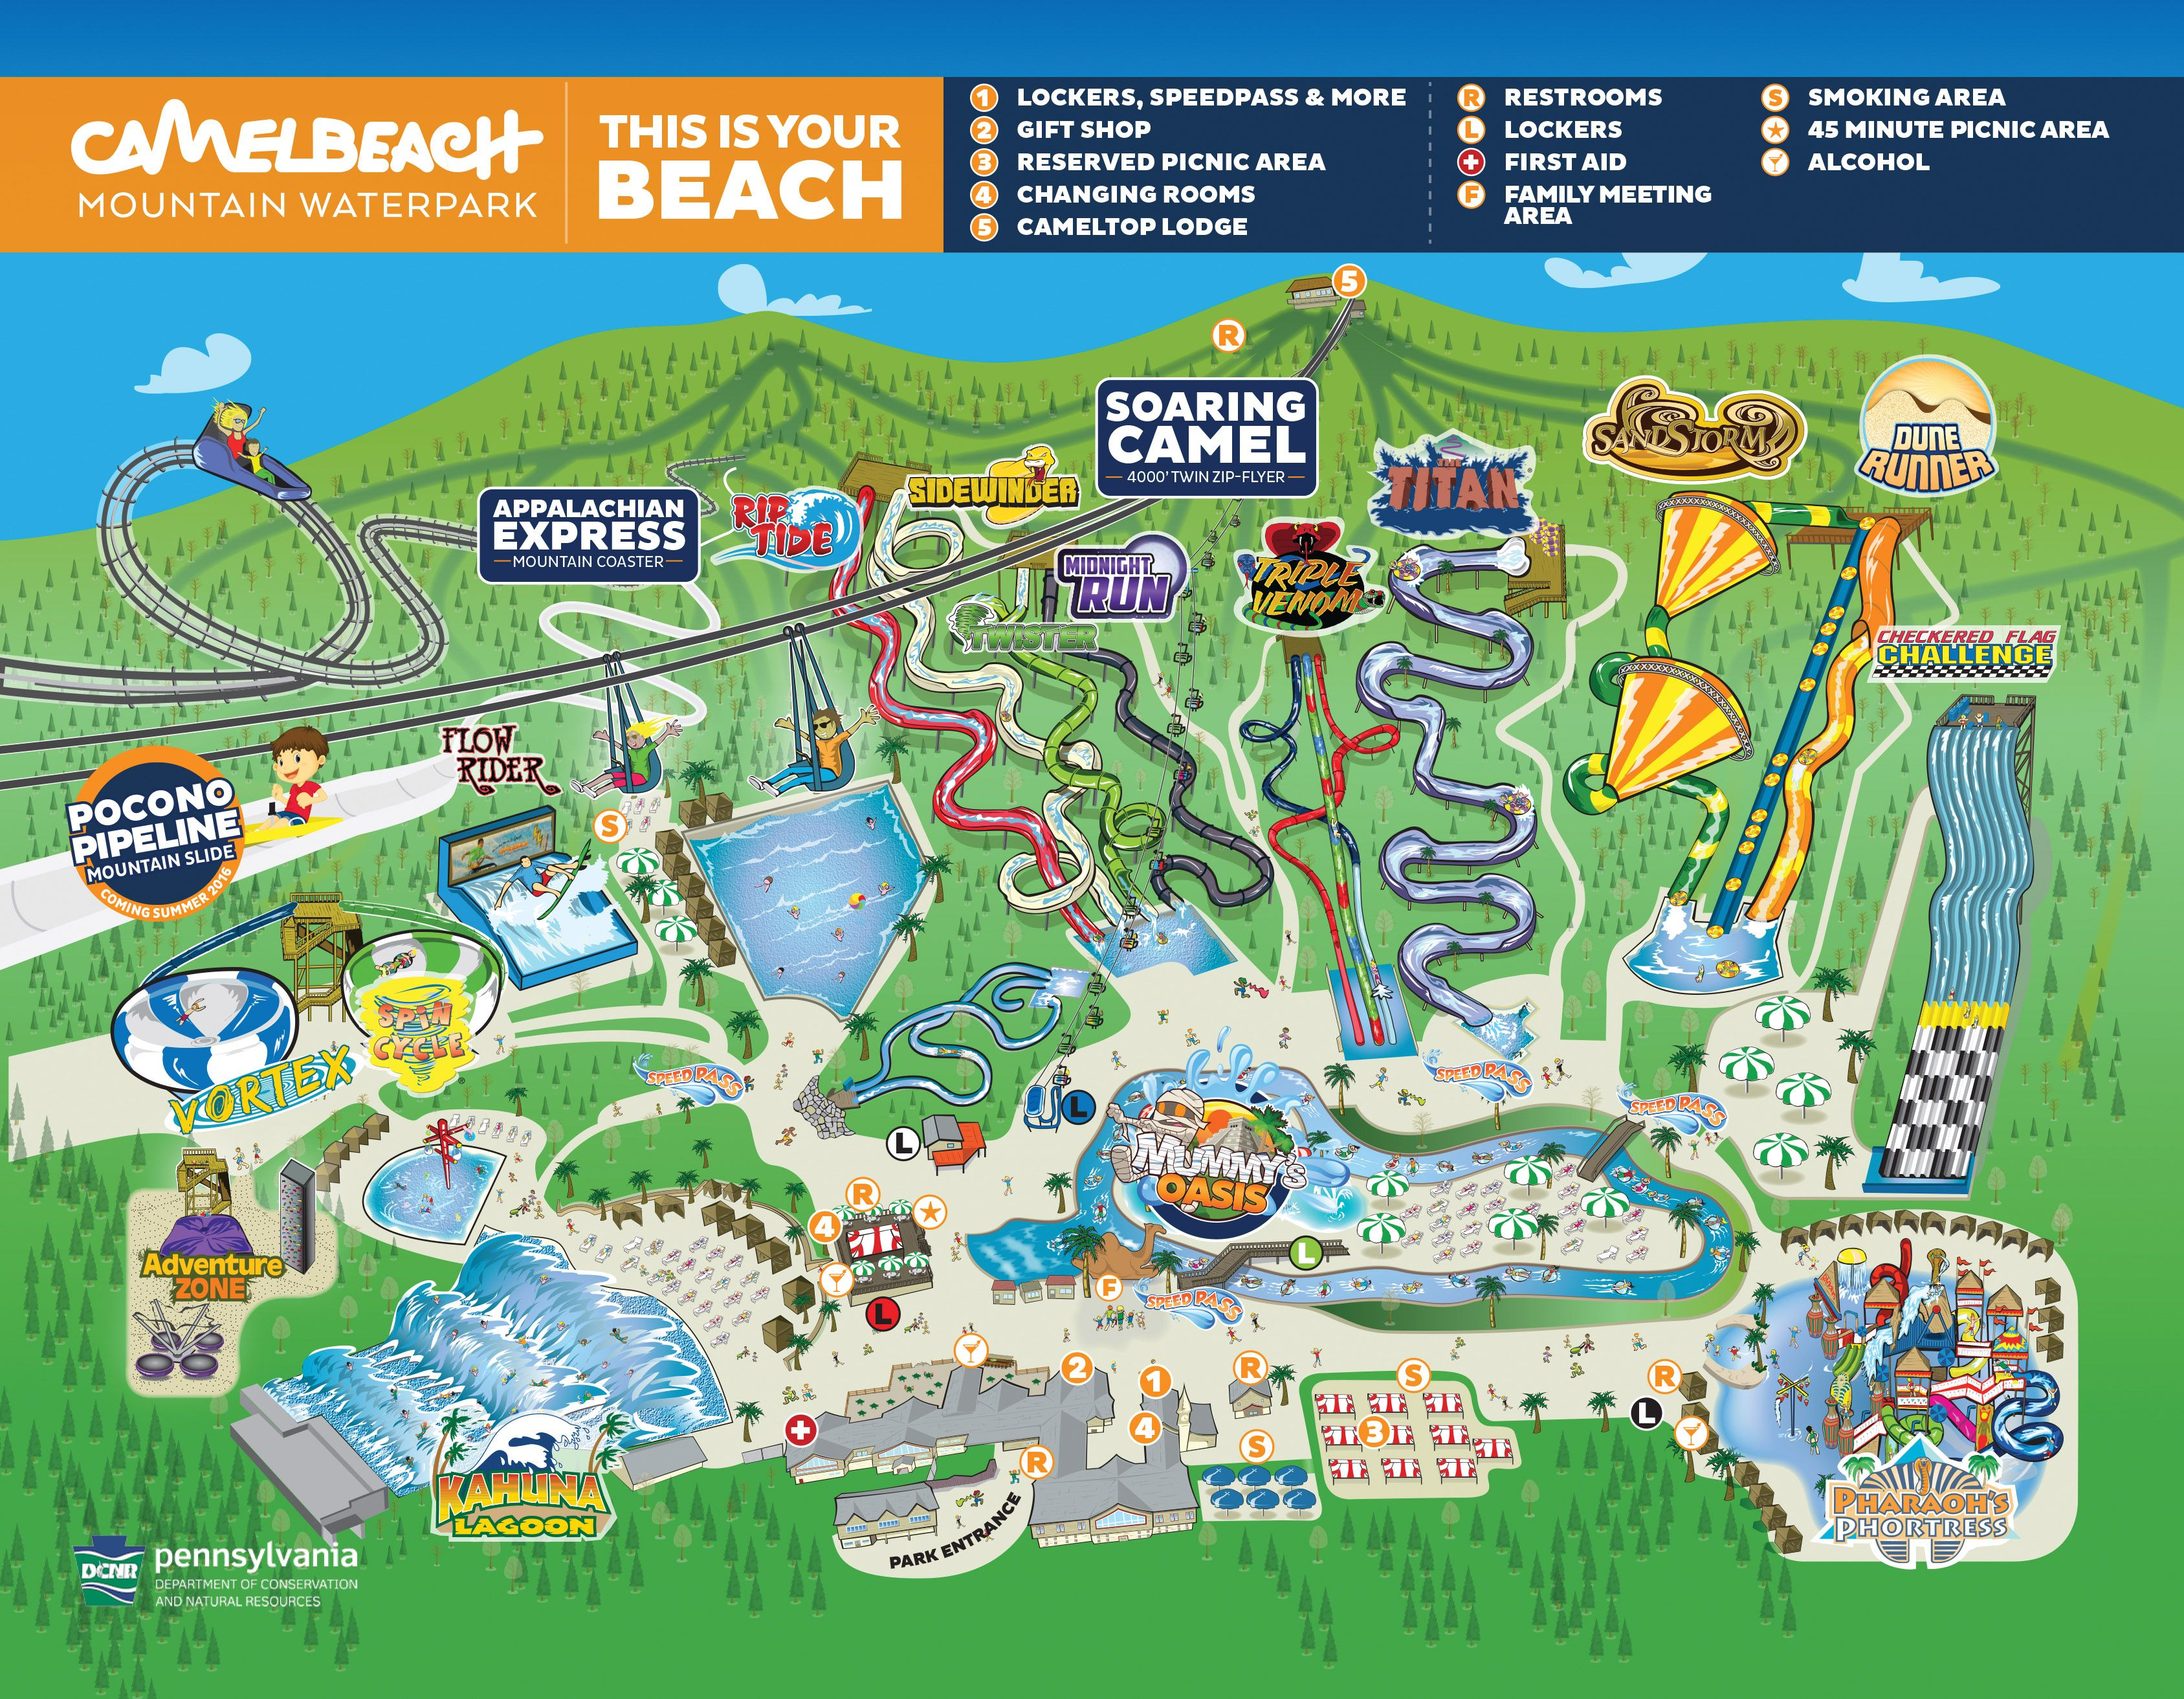 Camelbeach Waterpark Map